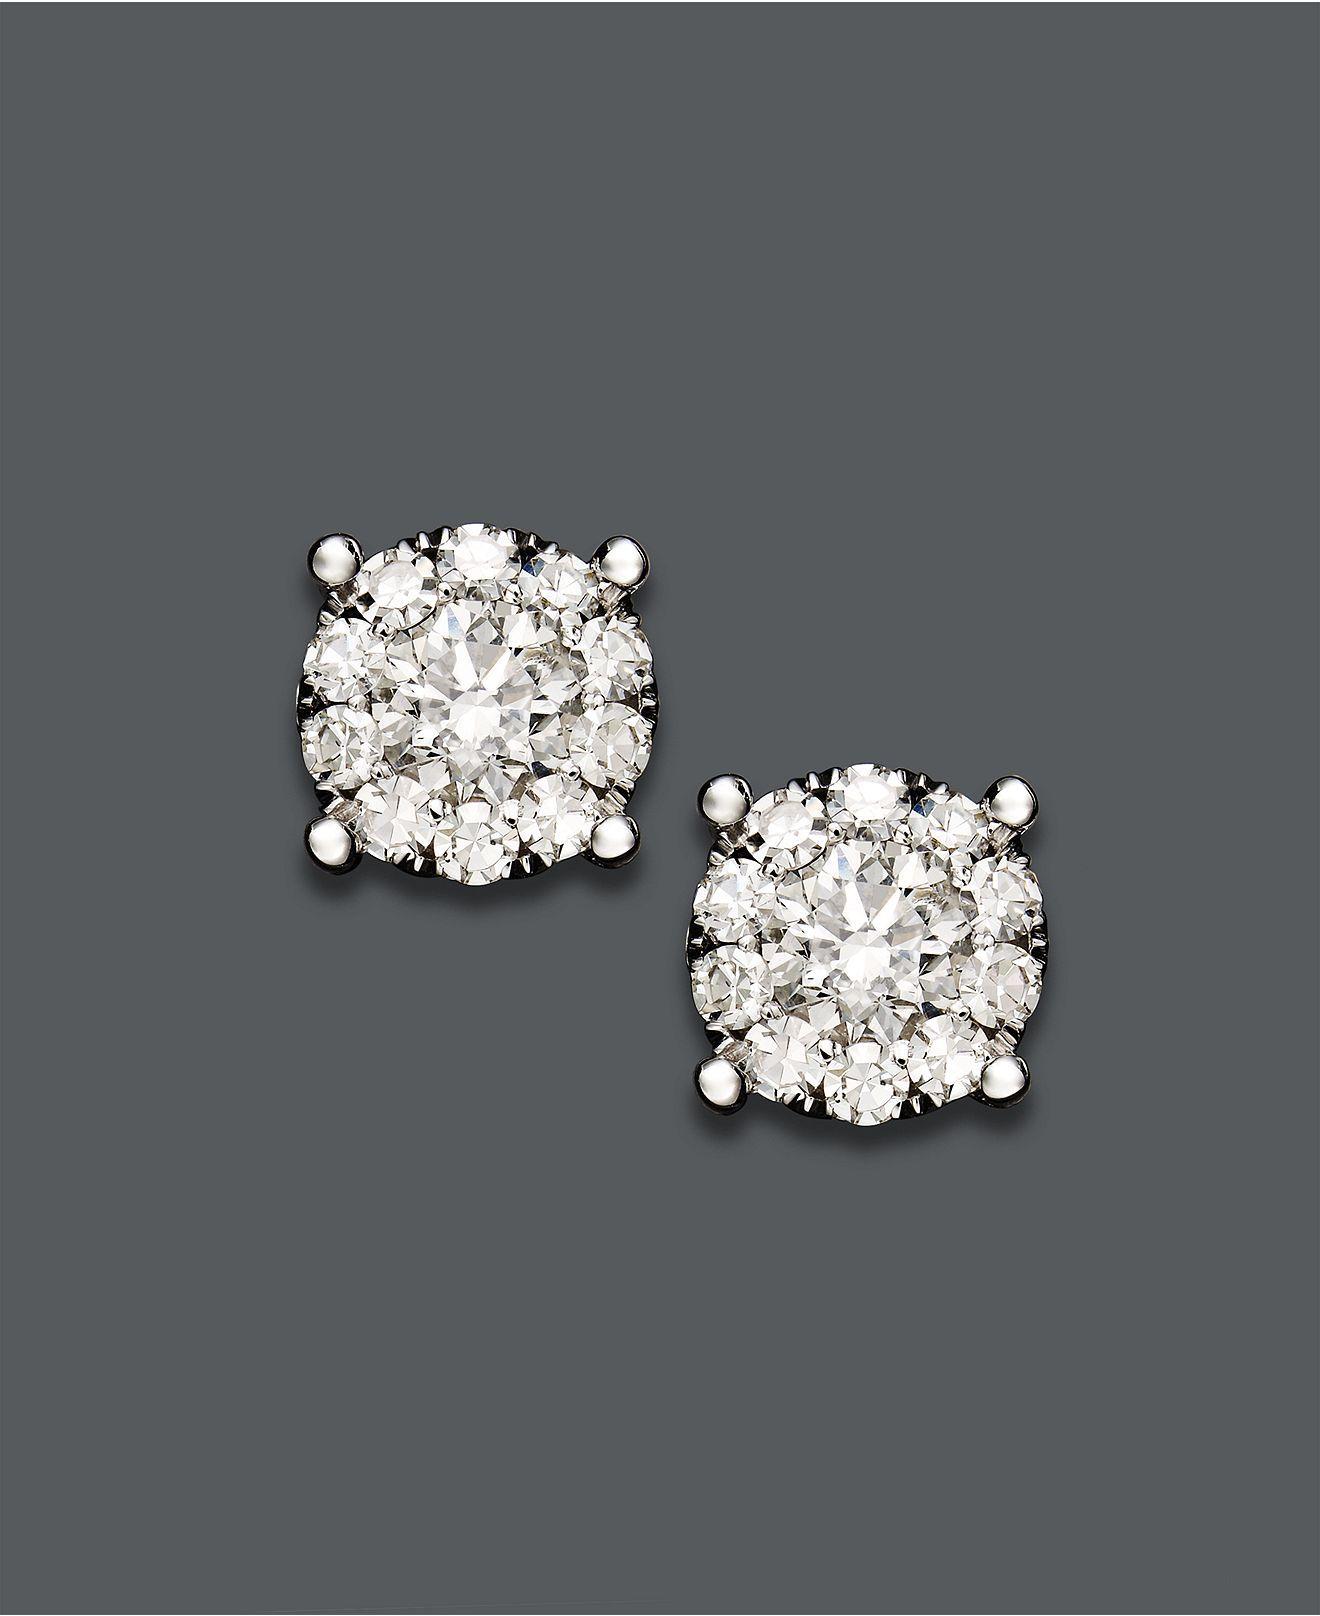 0afddb3daa7 Prestige Unity Diamond Earrings, 14k White Gold Diamond Circle Stud ...